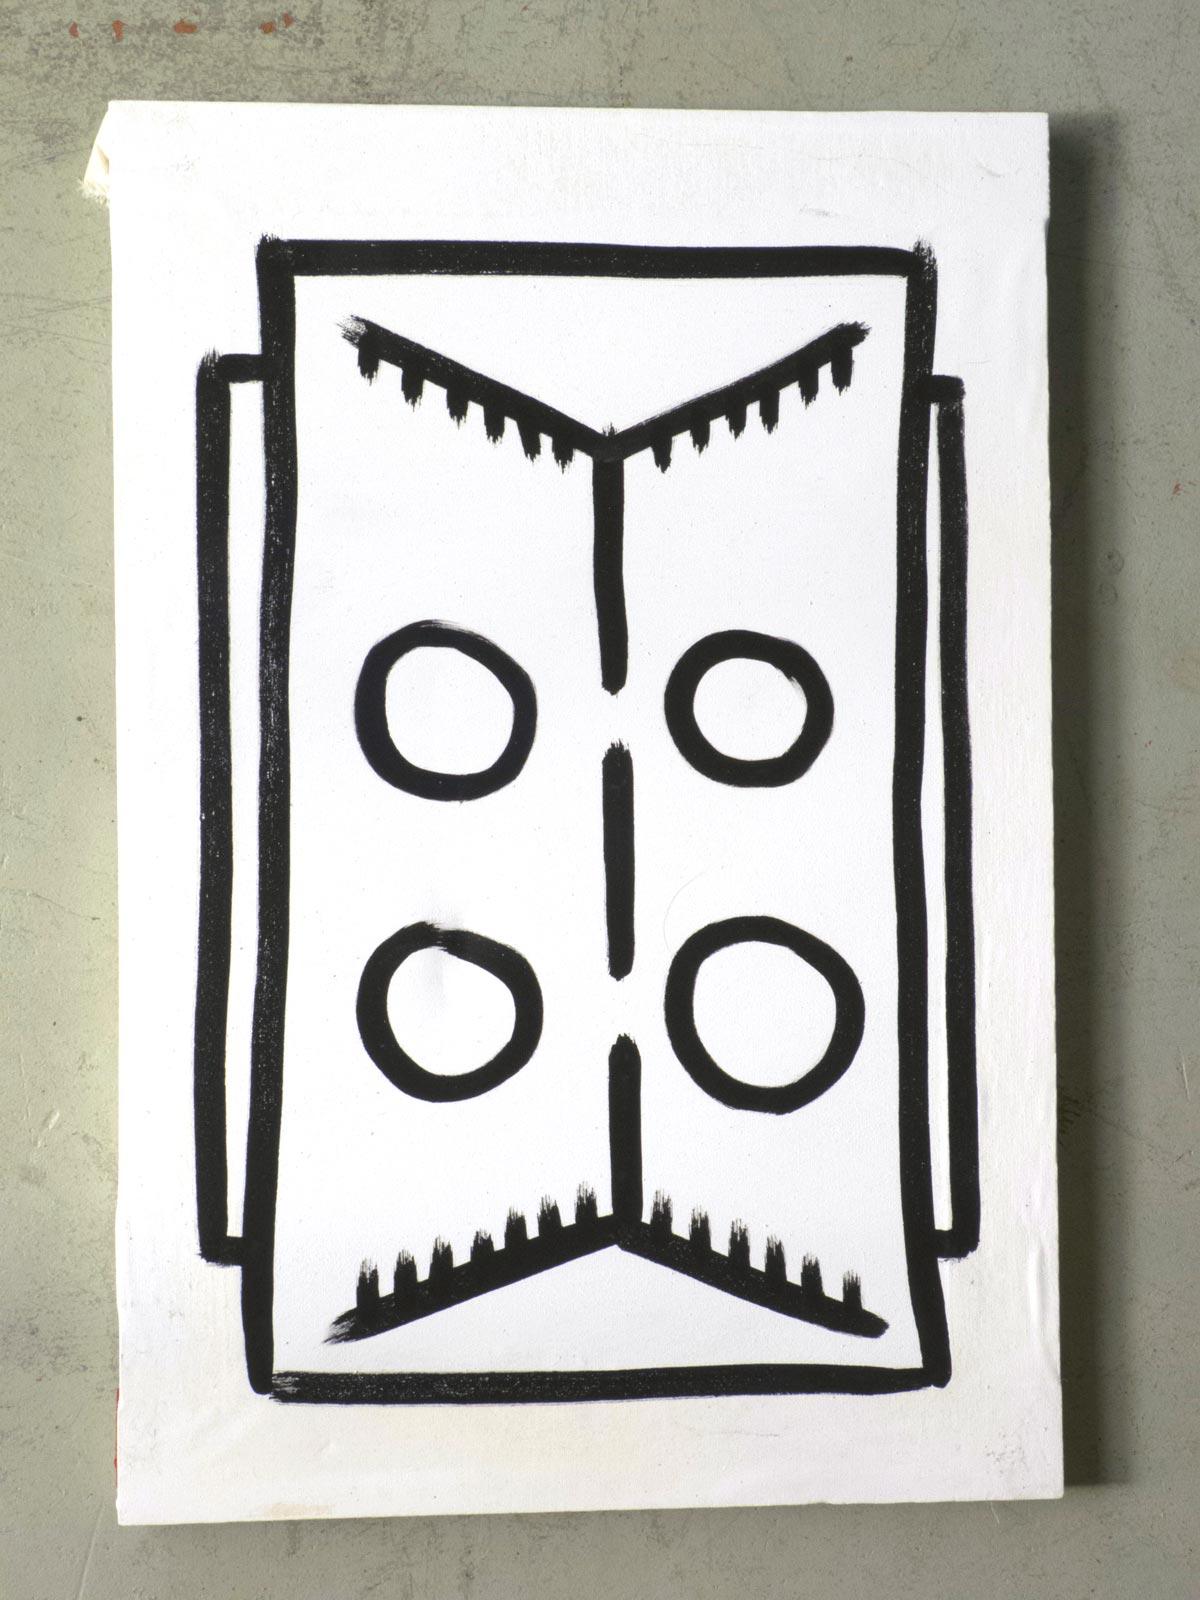 Urban-Manegold-There-is-no-Private-Privatleben-Privatsphäre-Rauminstallation-Experiment-Typographie-Portrait-Gesellschaft-Licht-Kunst-Transparent-LED-Madlight-portrait_multiplex_5